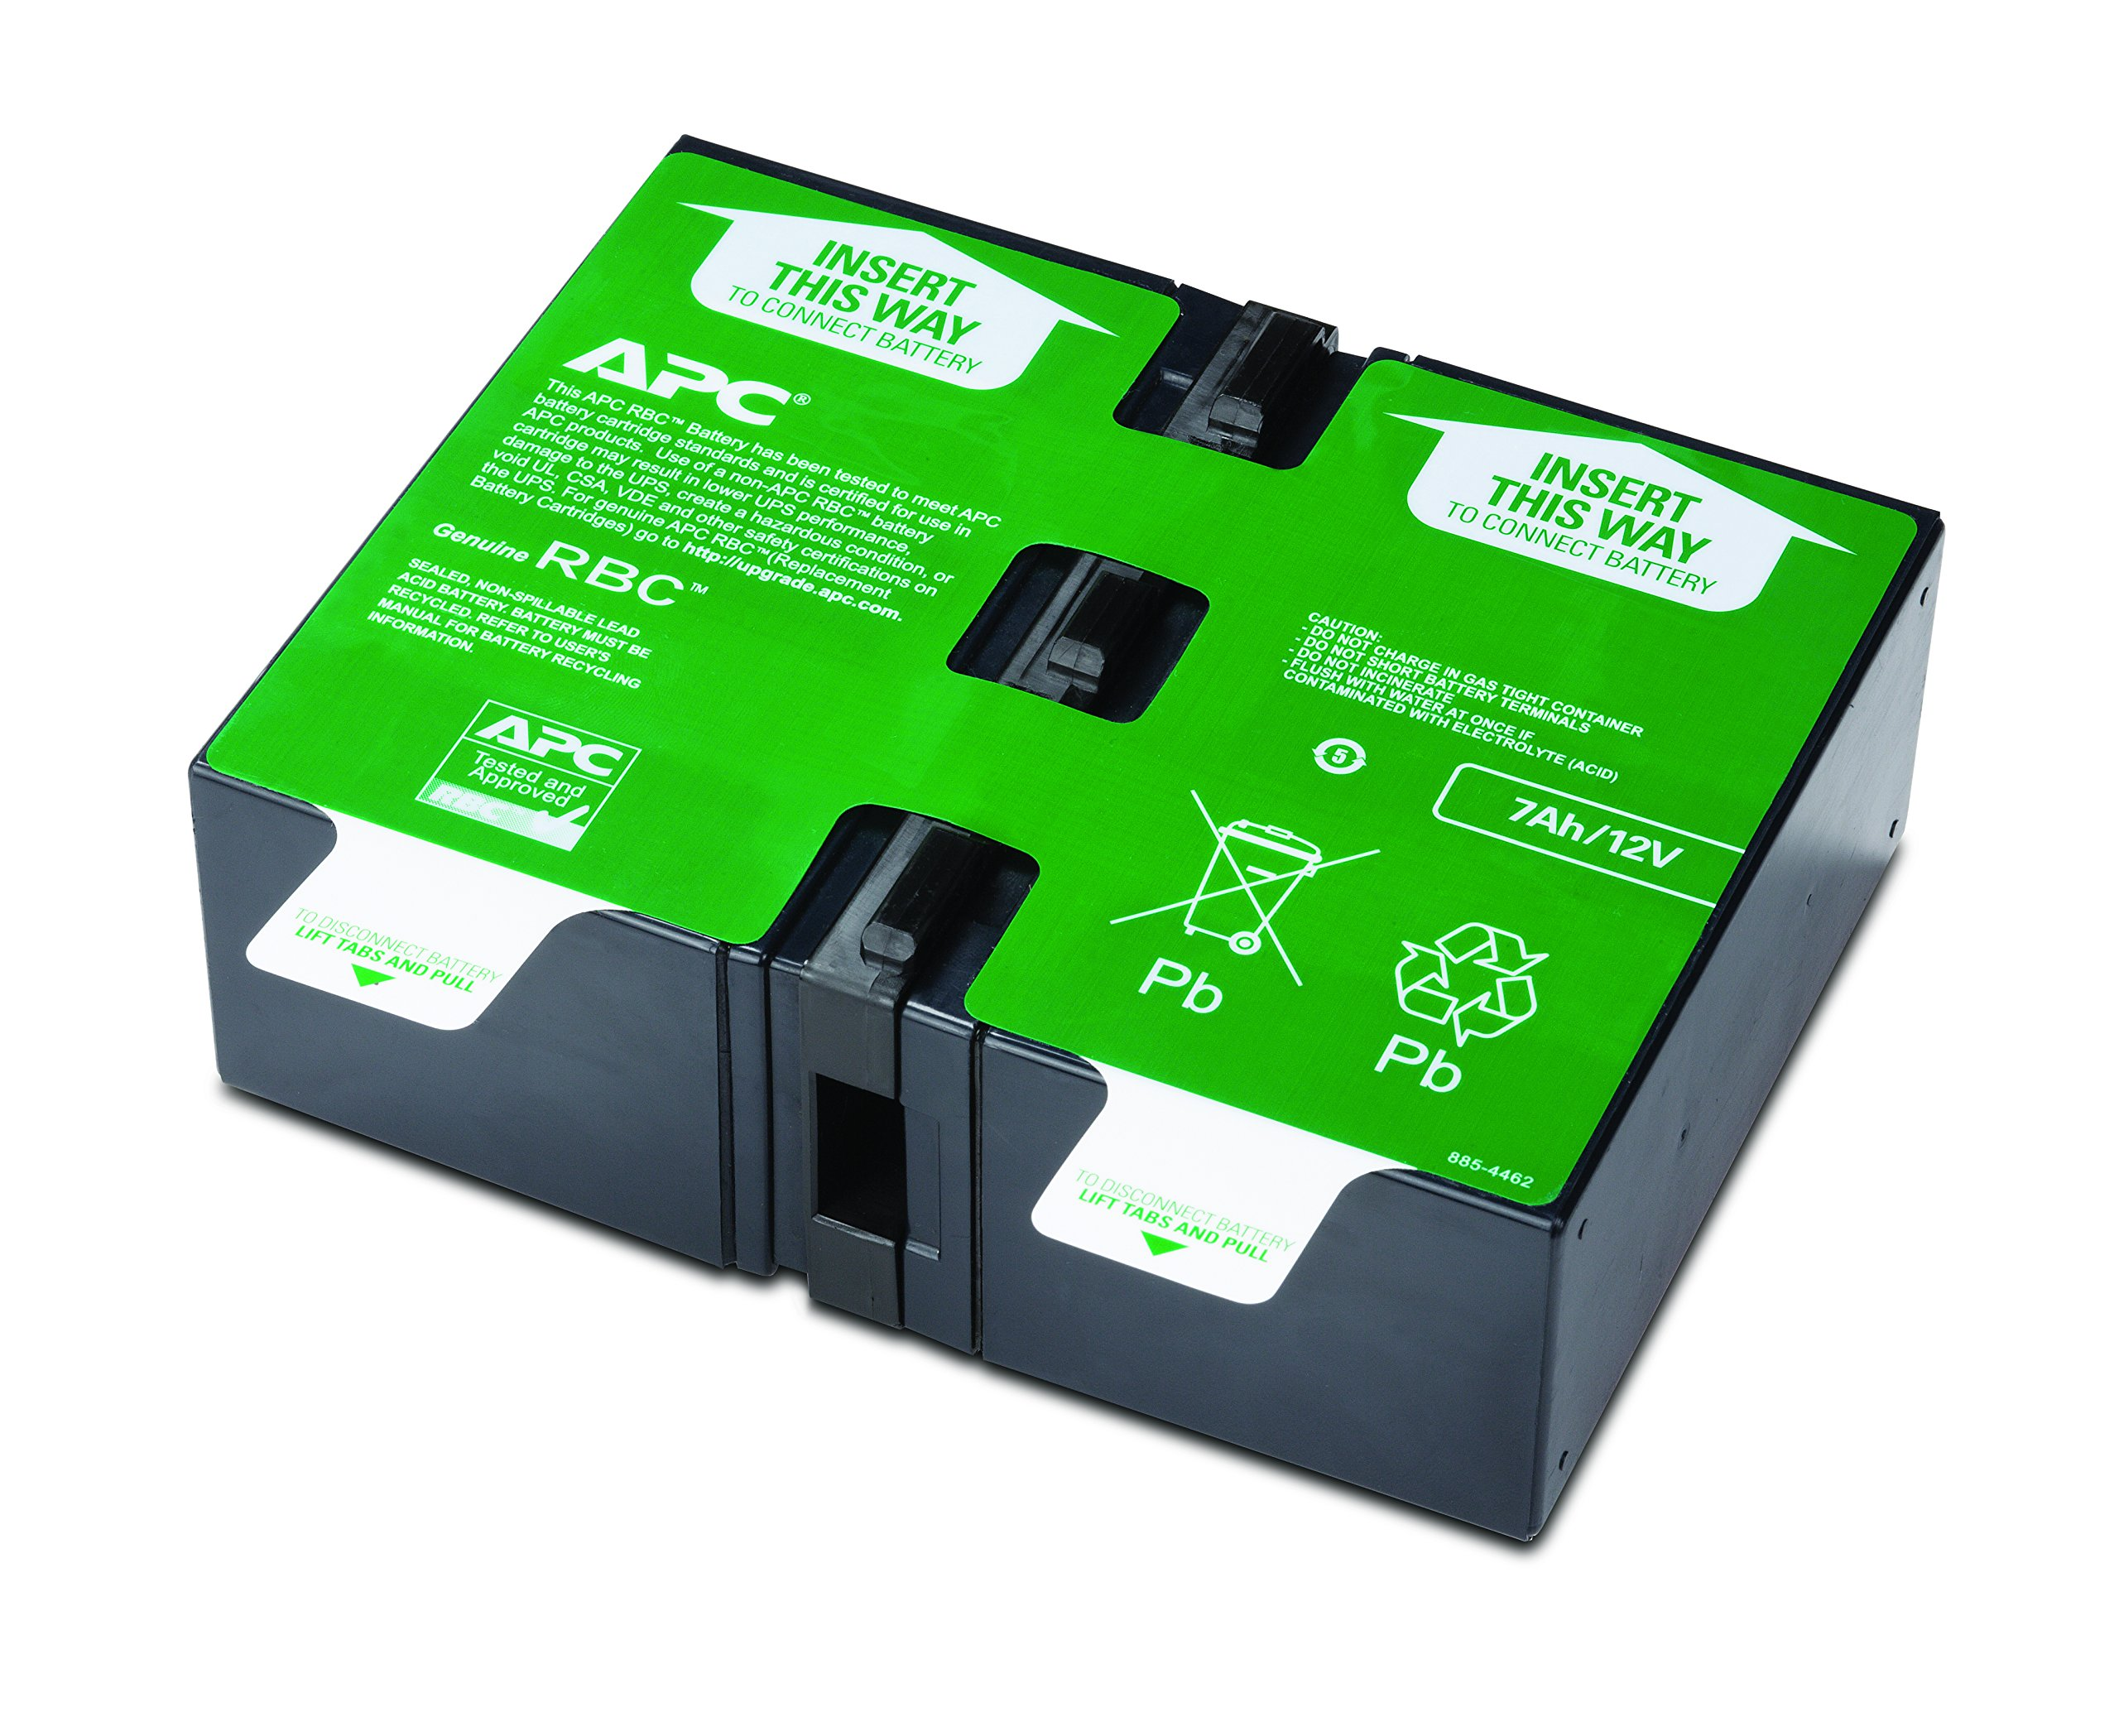 Thetford 633575 Heater Cartridge